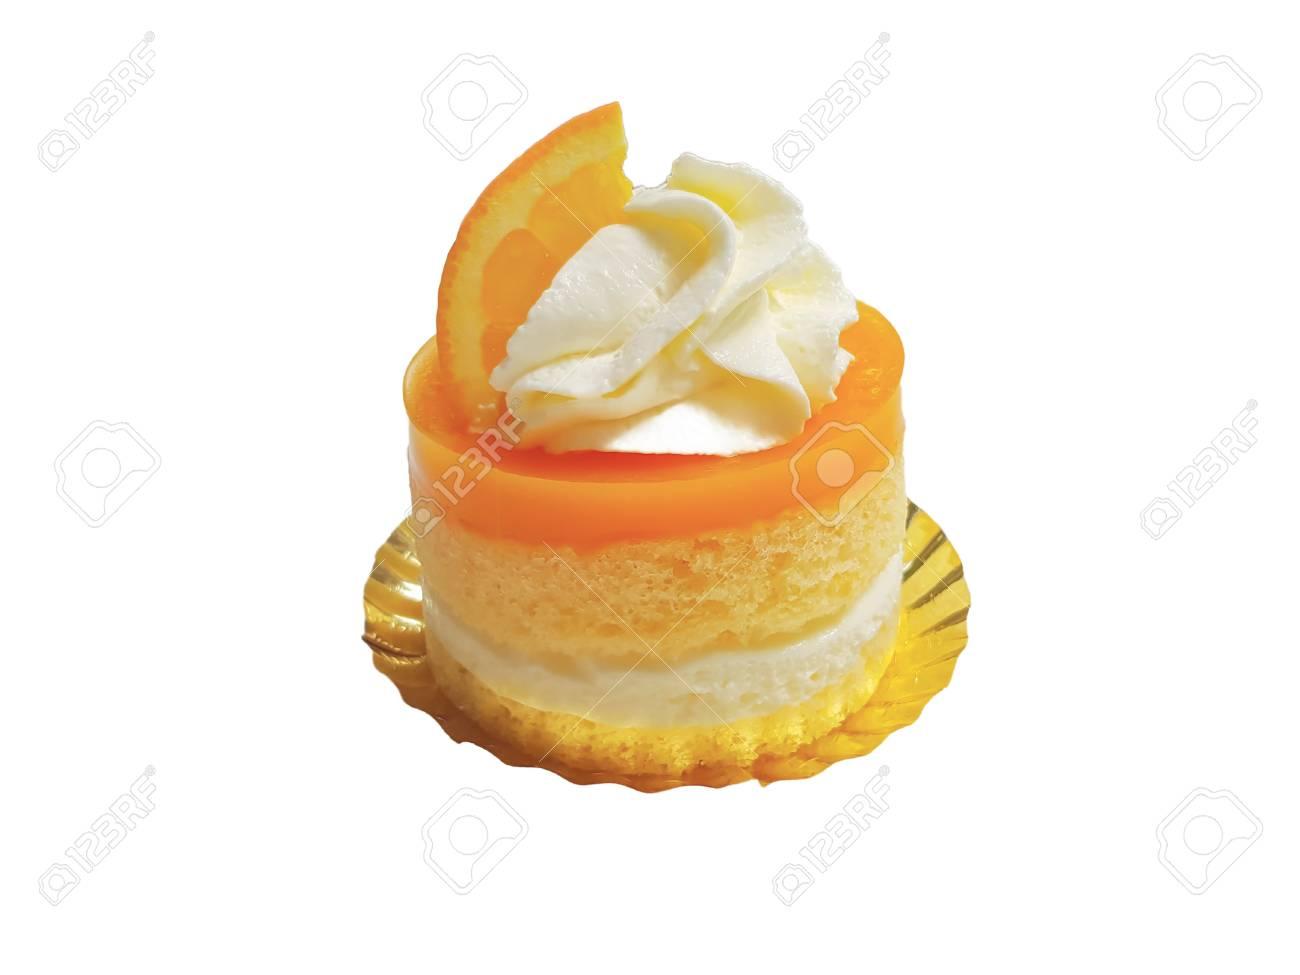 Orange Cake With Whipping Cream And Orange Topping On White Background